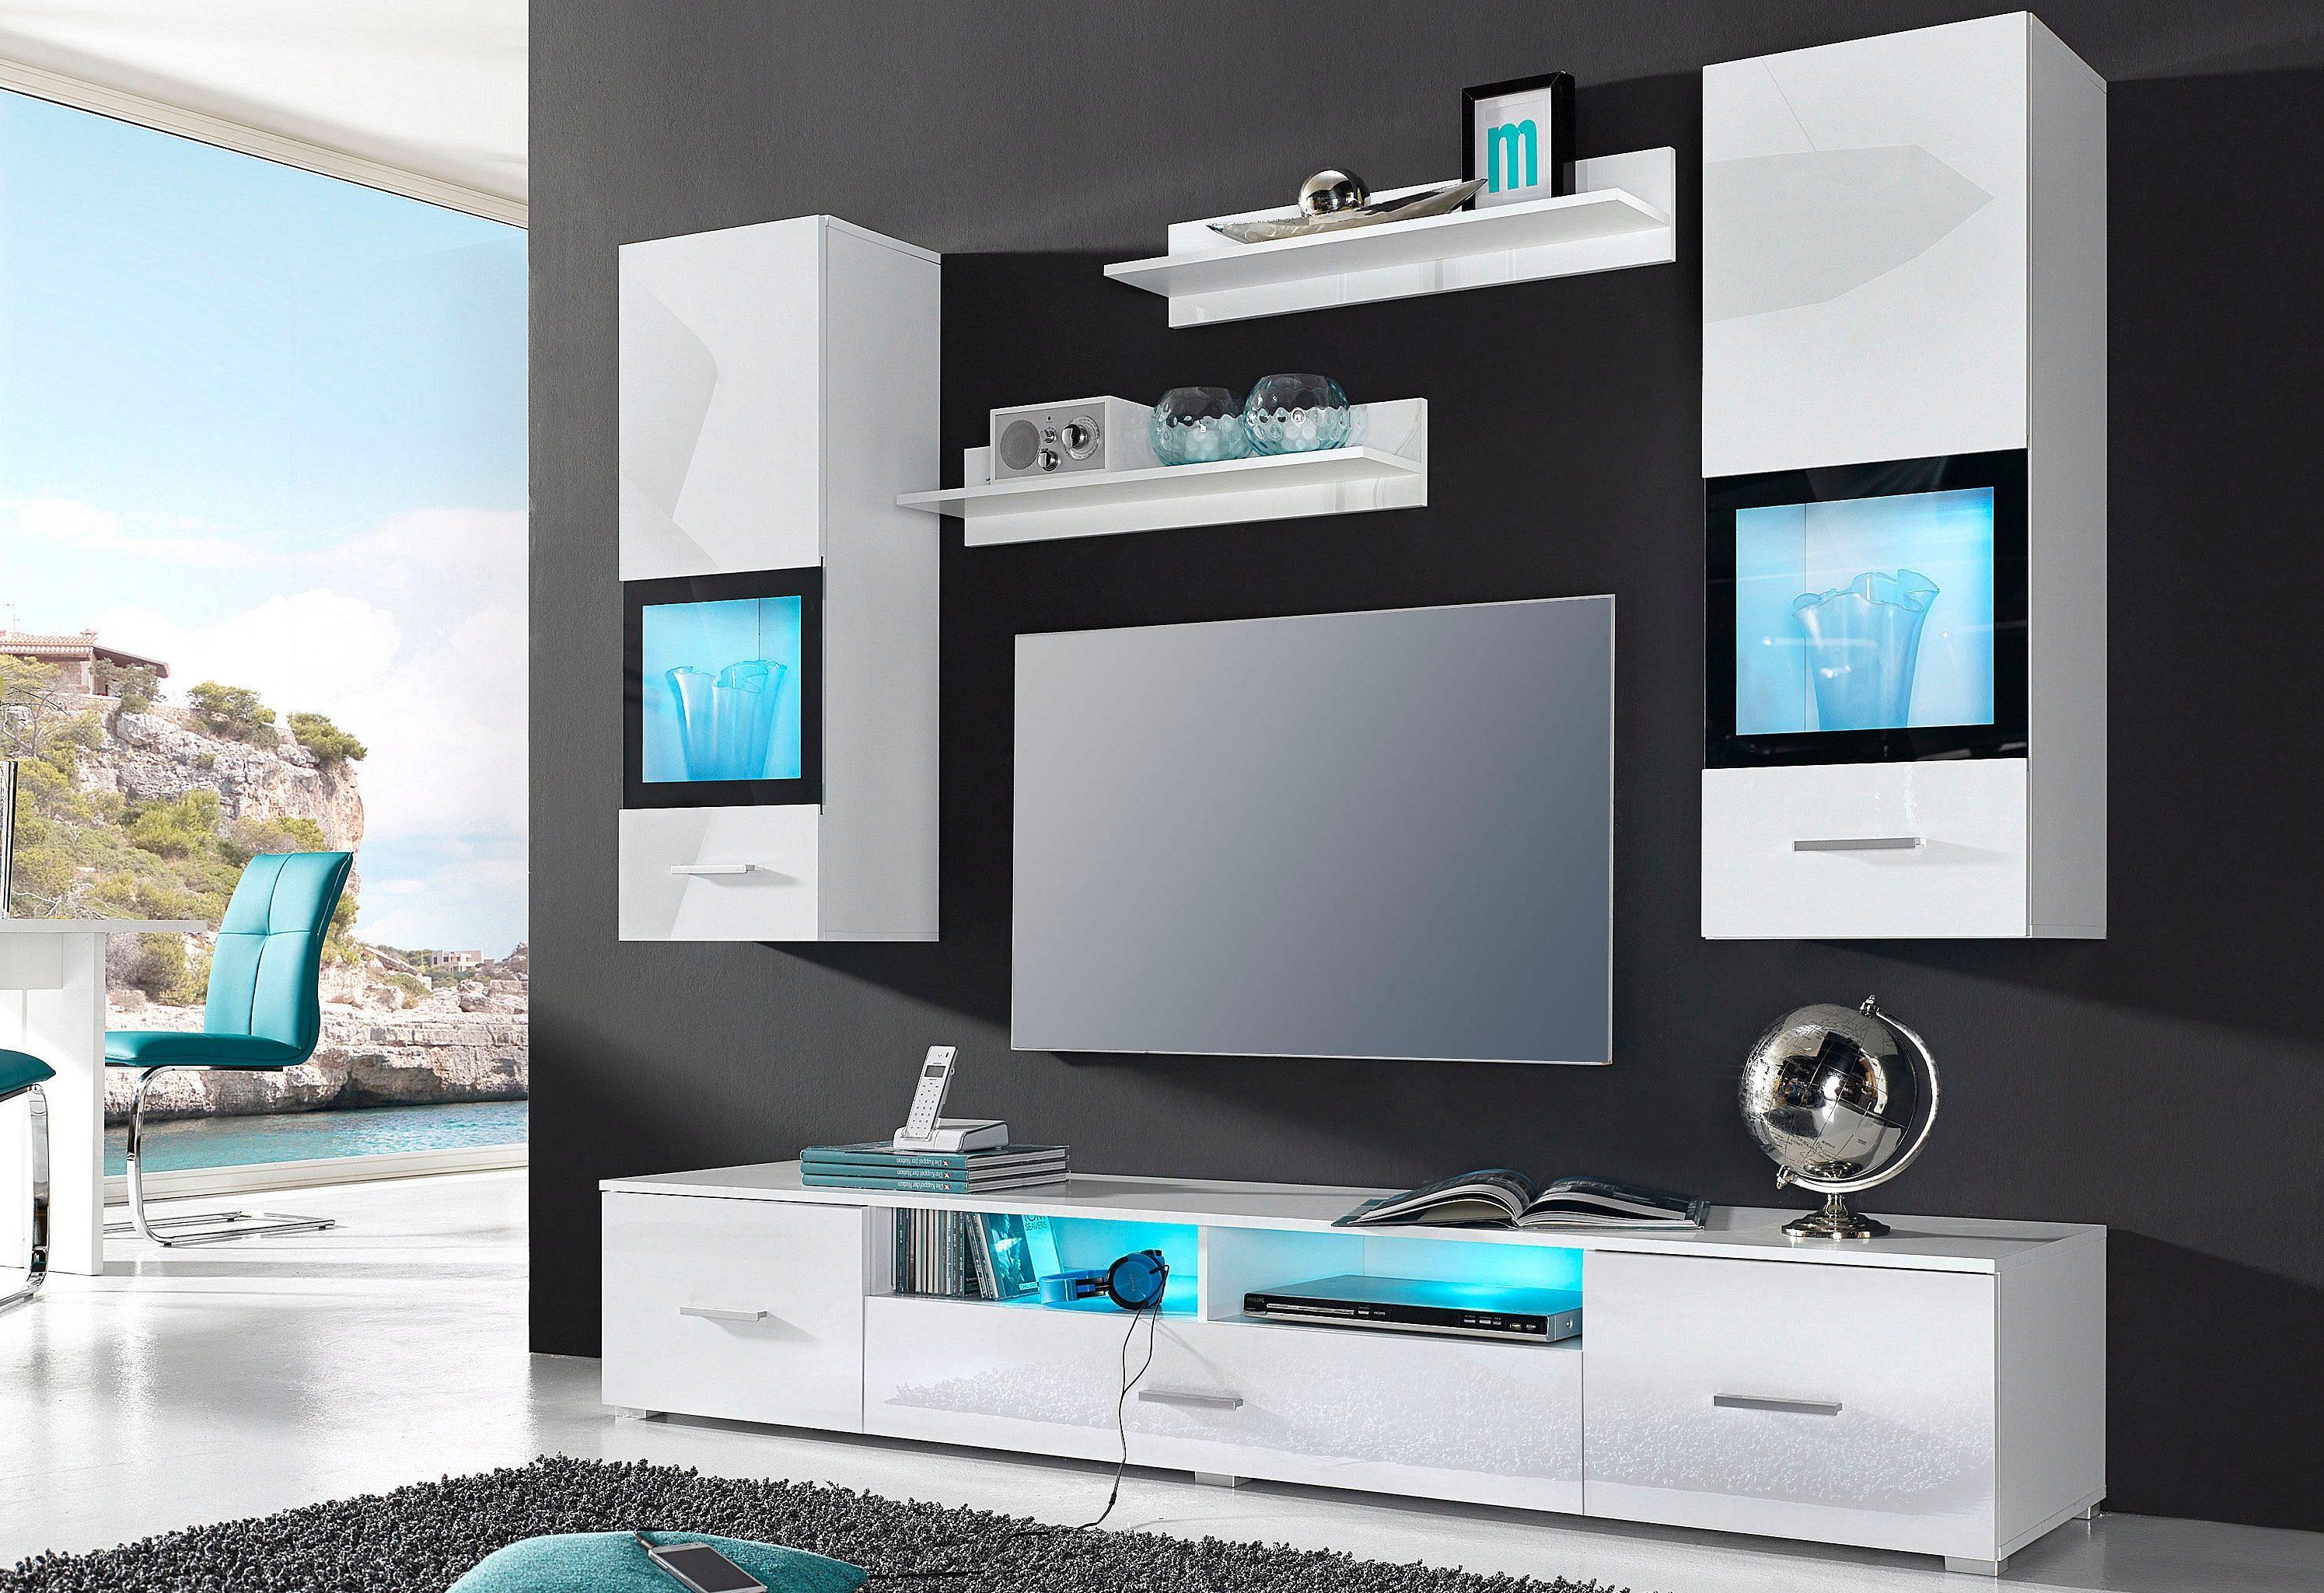 Tv meubel dressoir kast